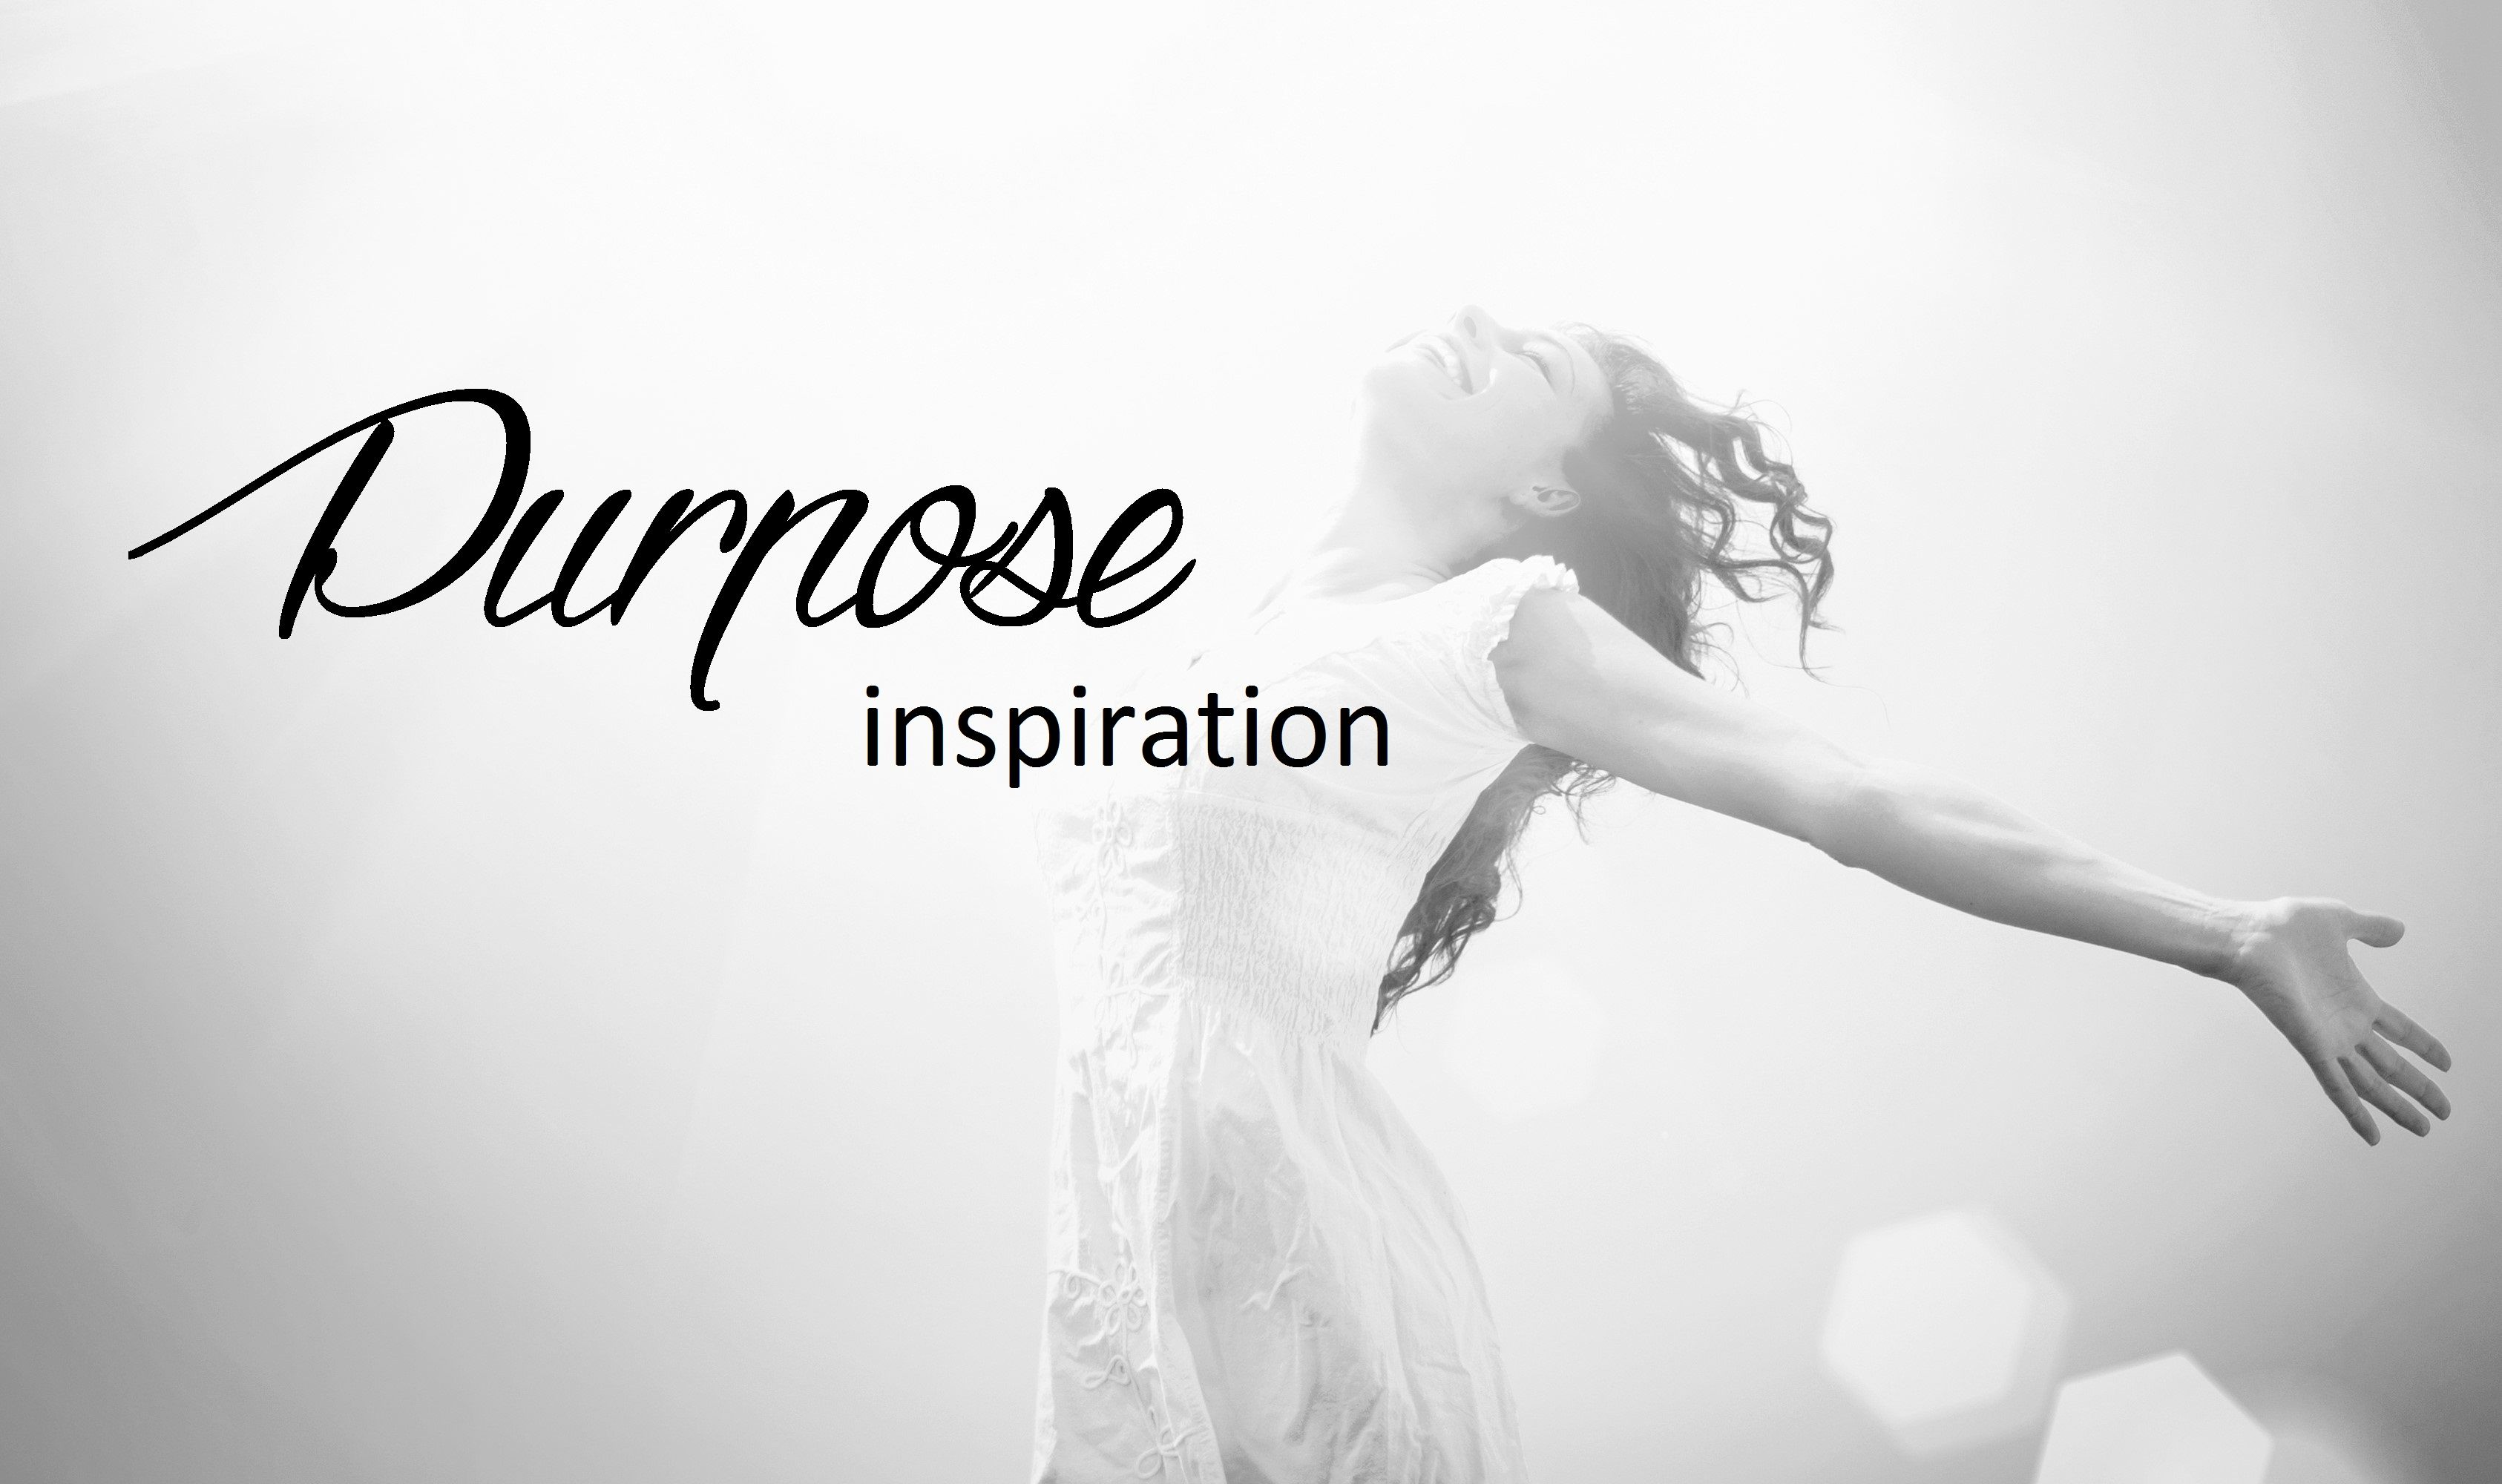 PuposeInspiration